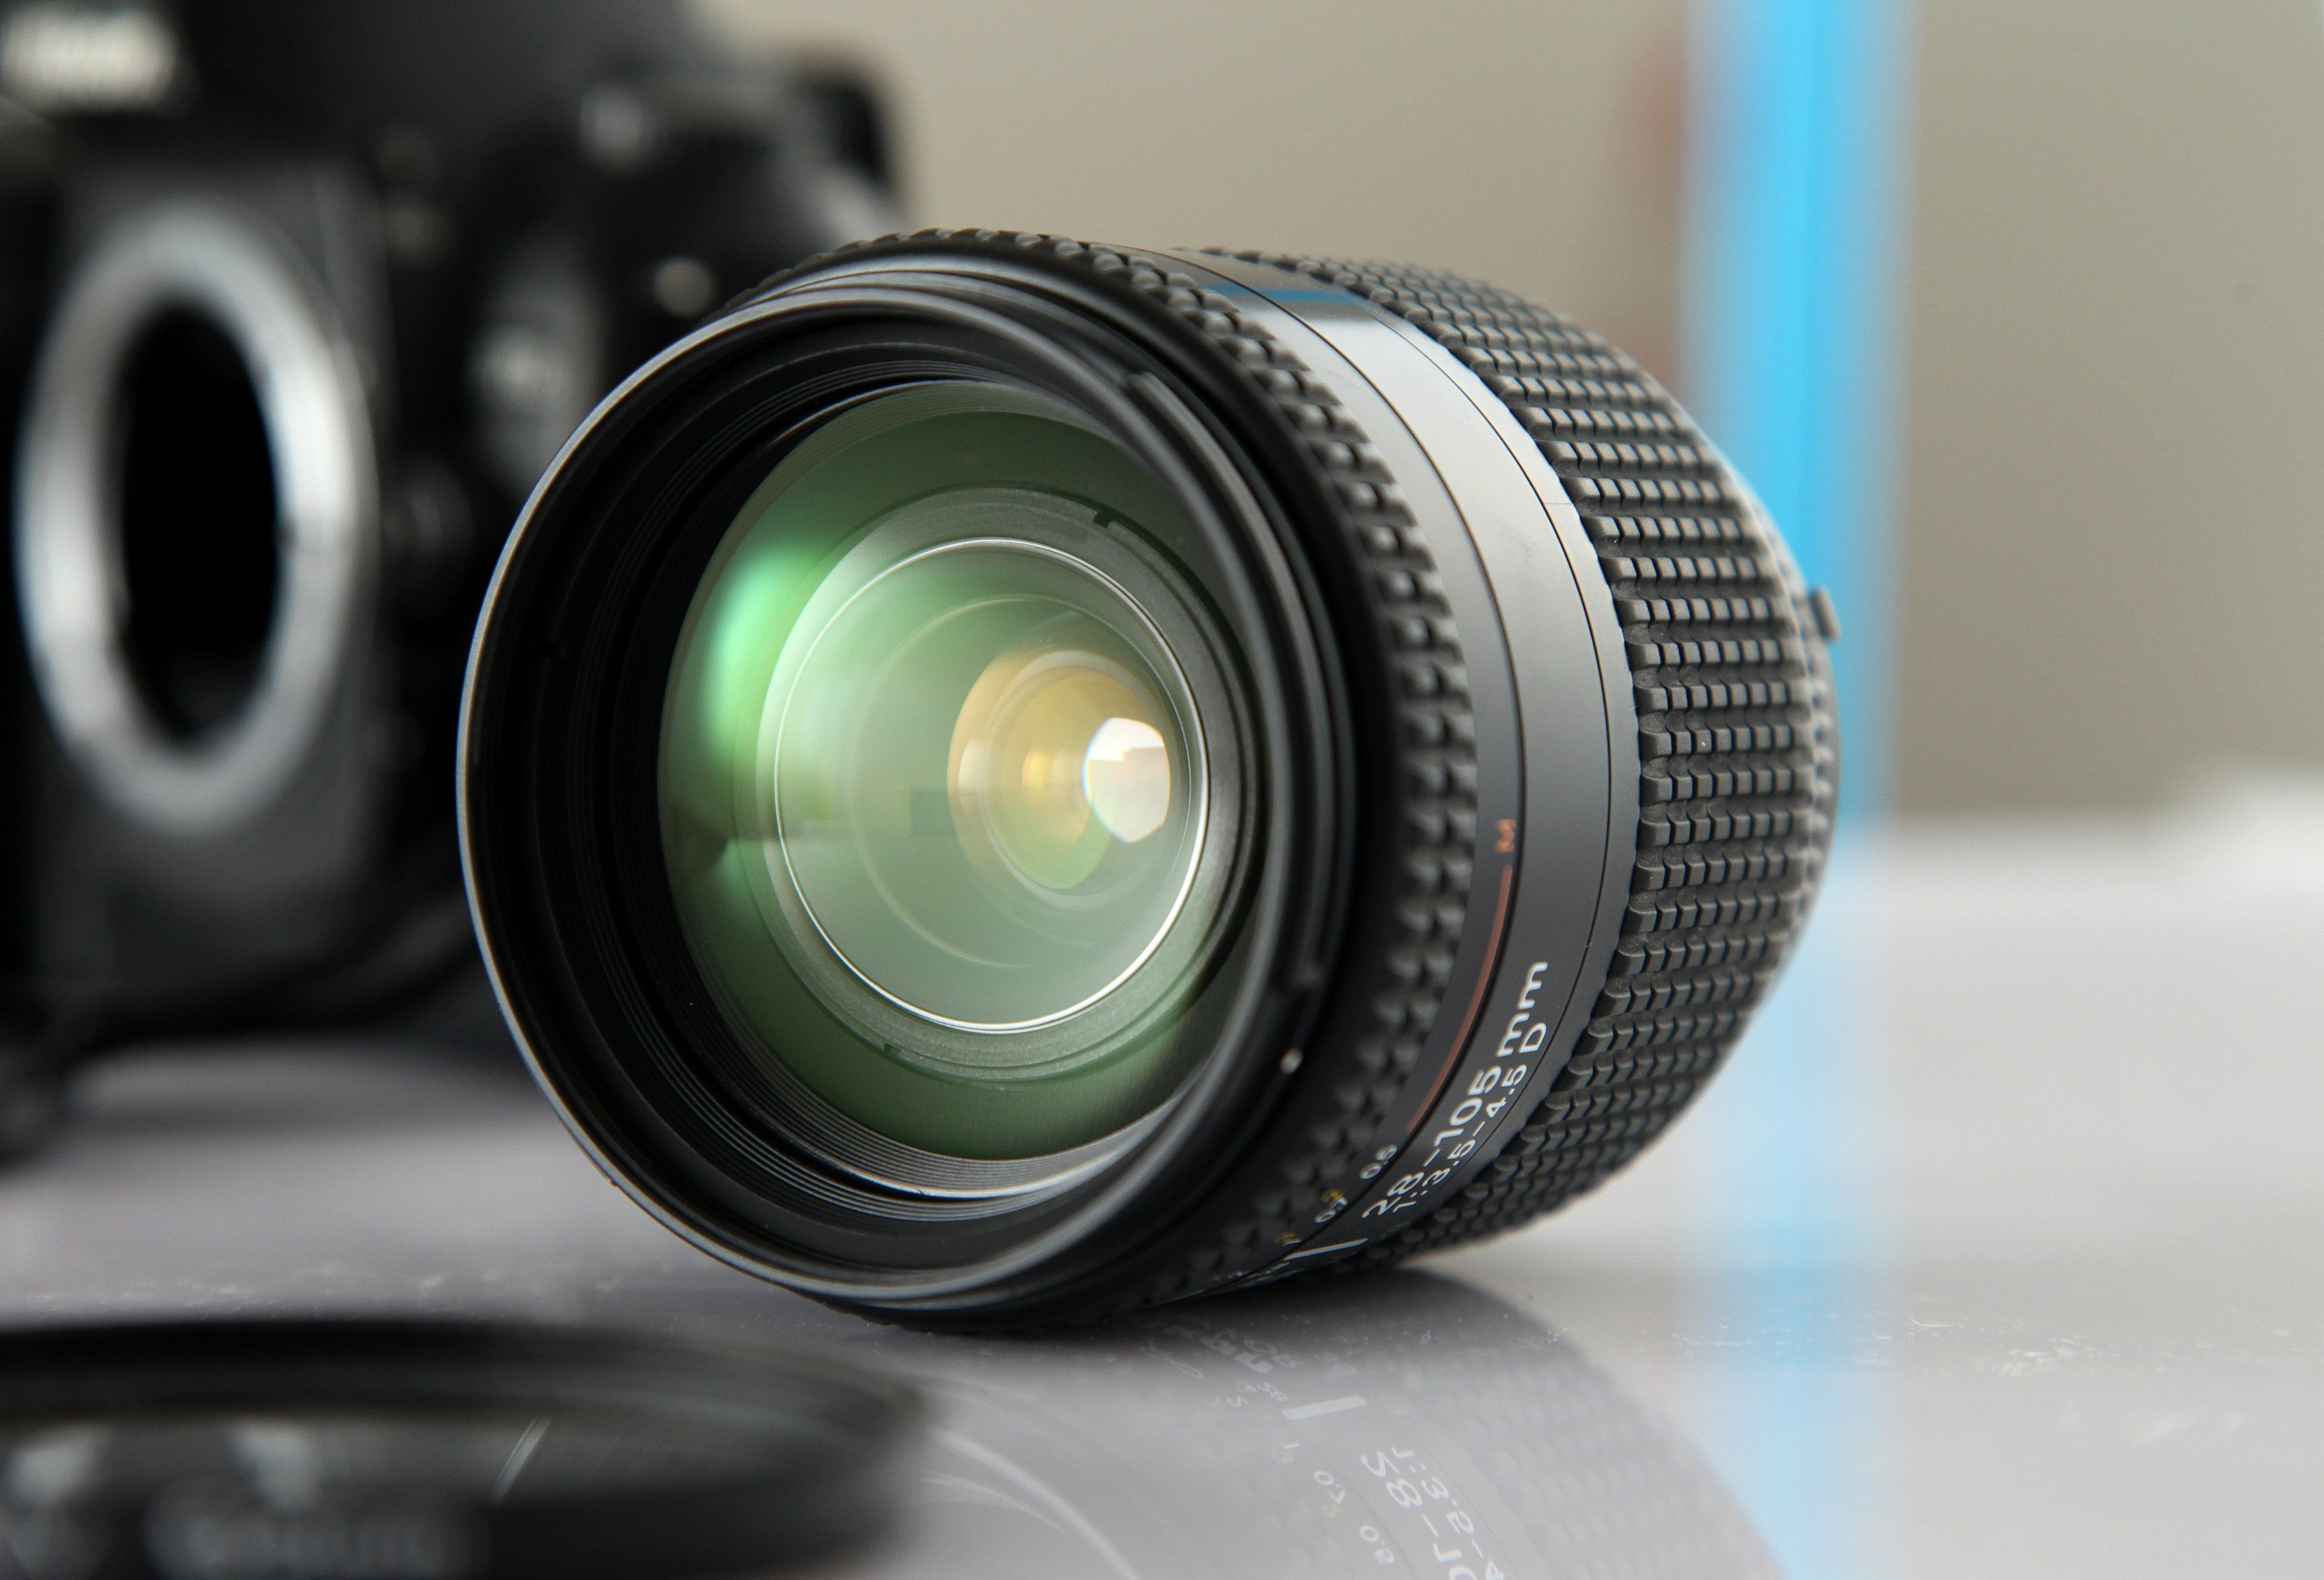 Black Camera Lens on White Sureface